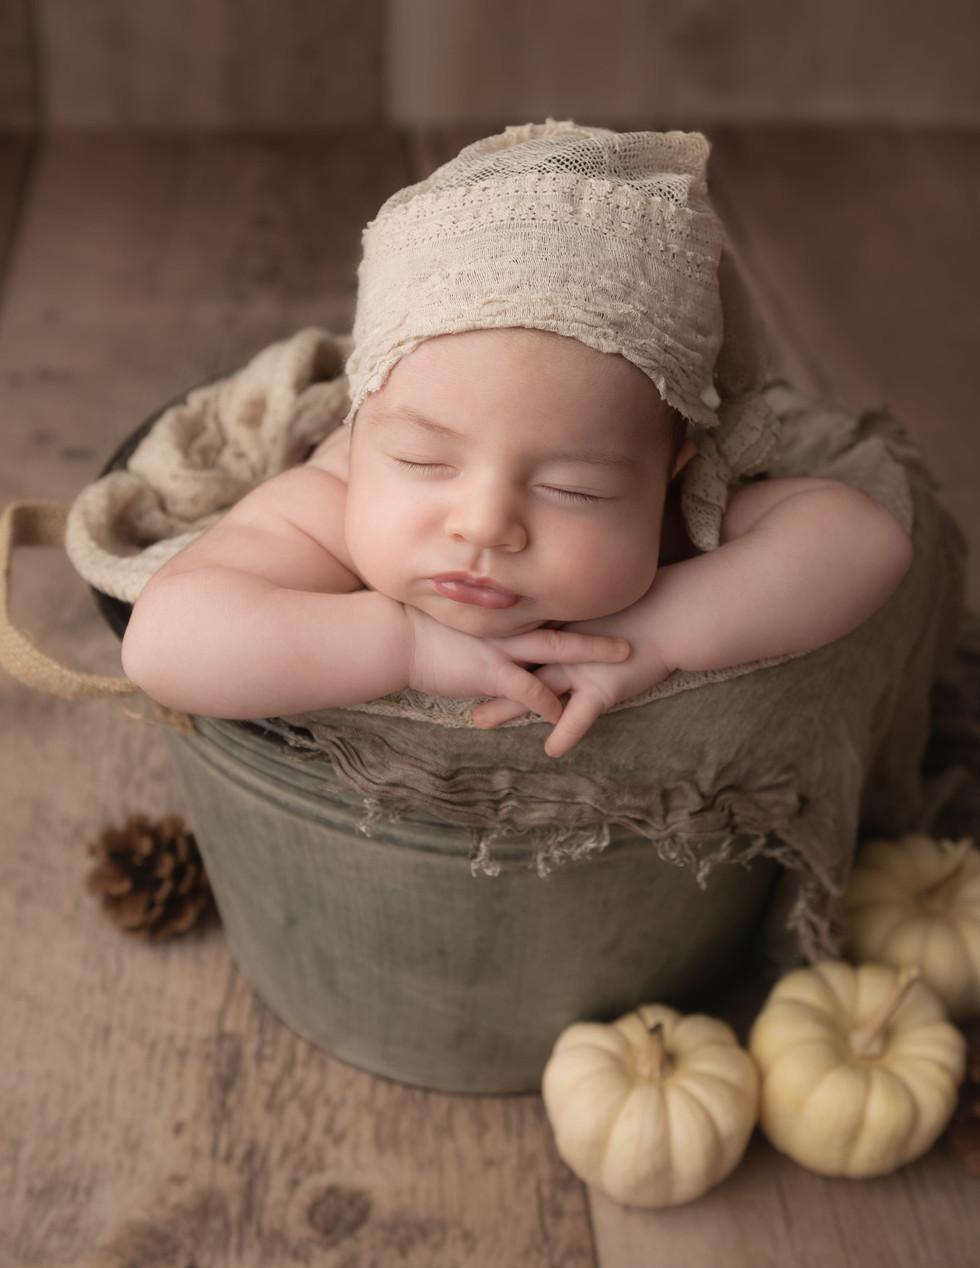 Newborn baby photography in bucket with pumpkins